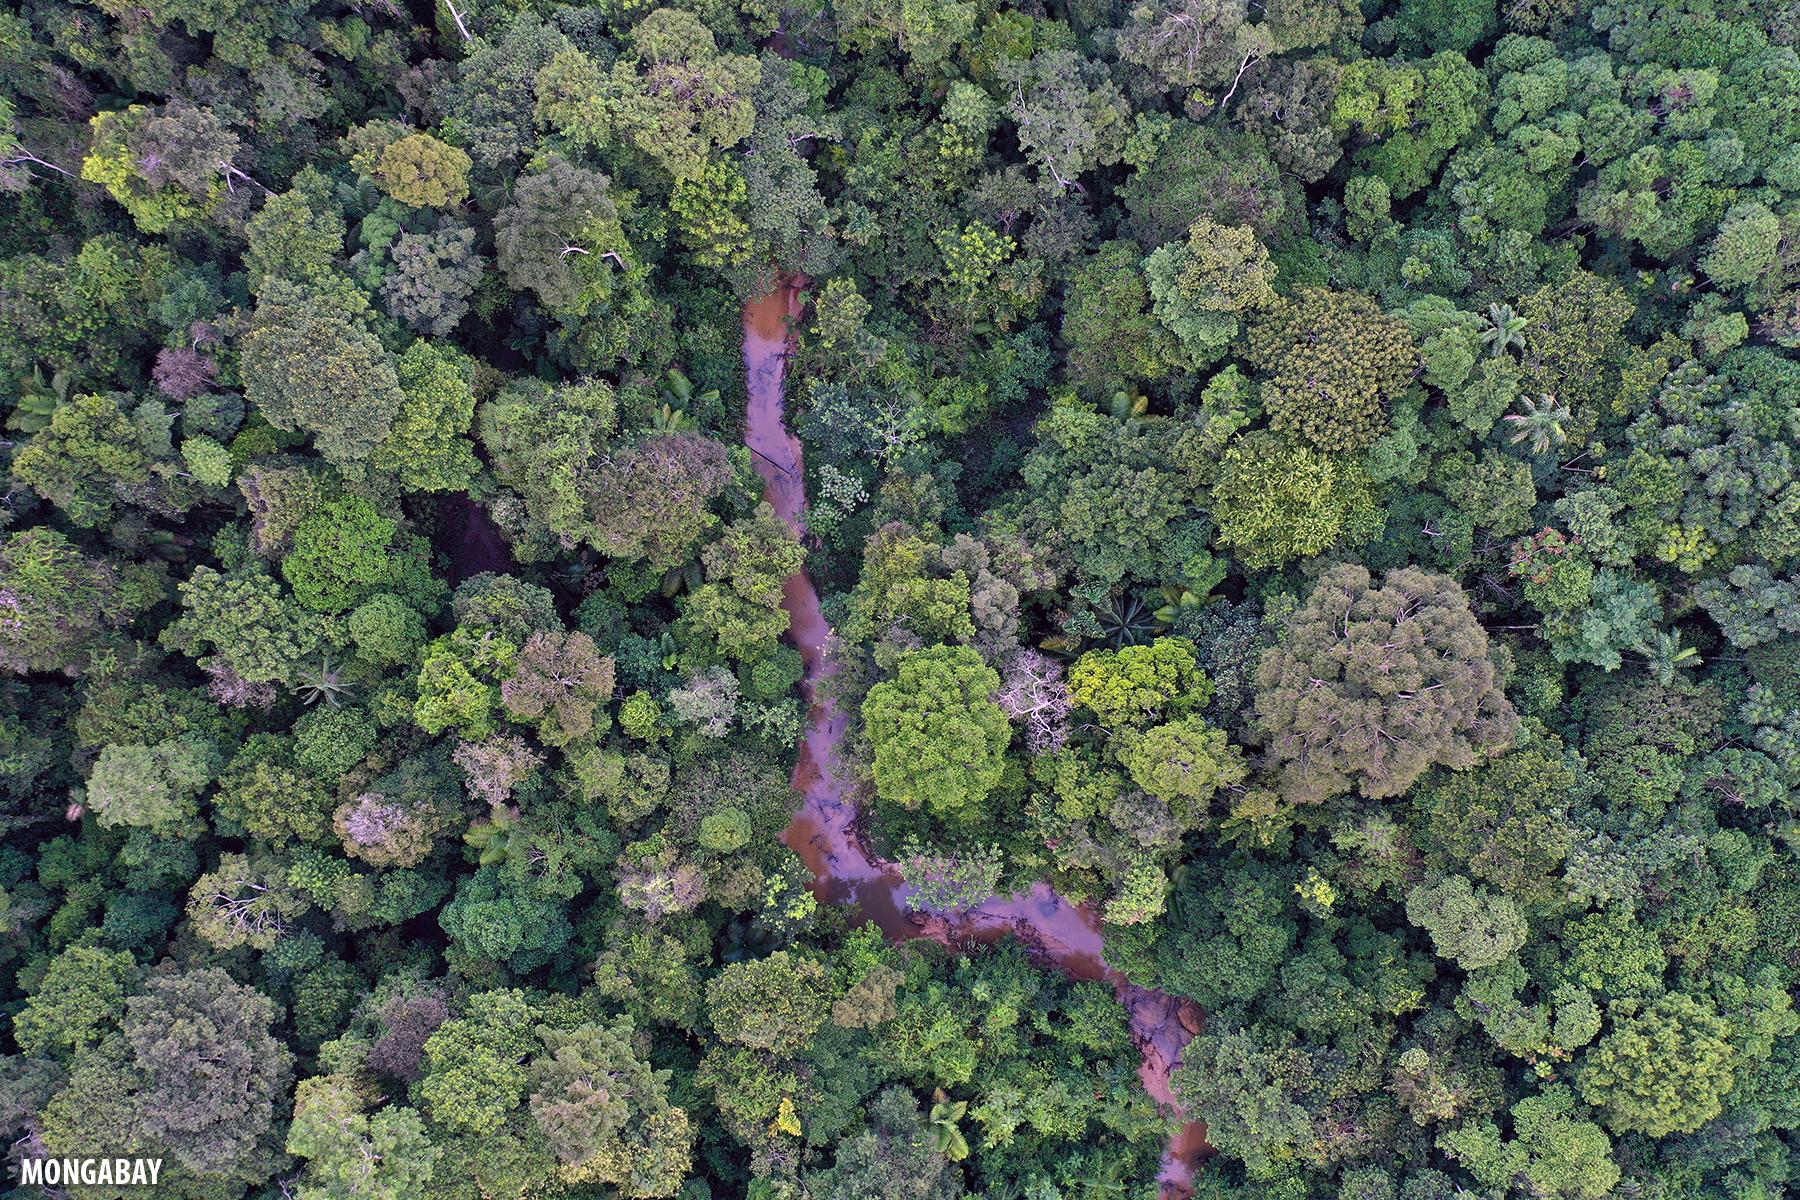 Rainforest creek in the Colombian Amazon